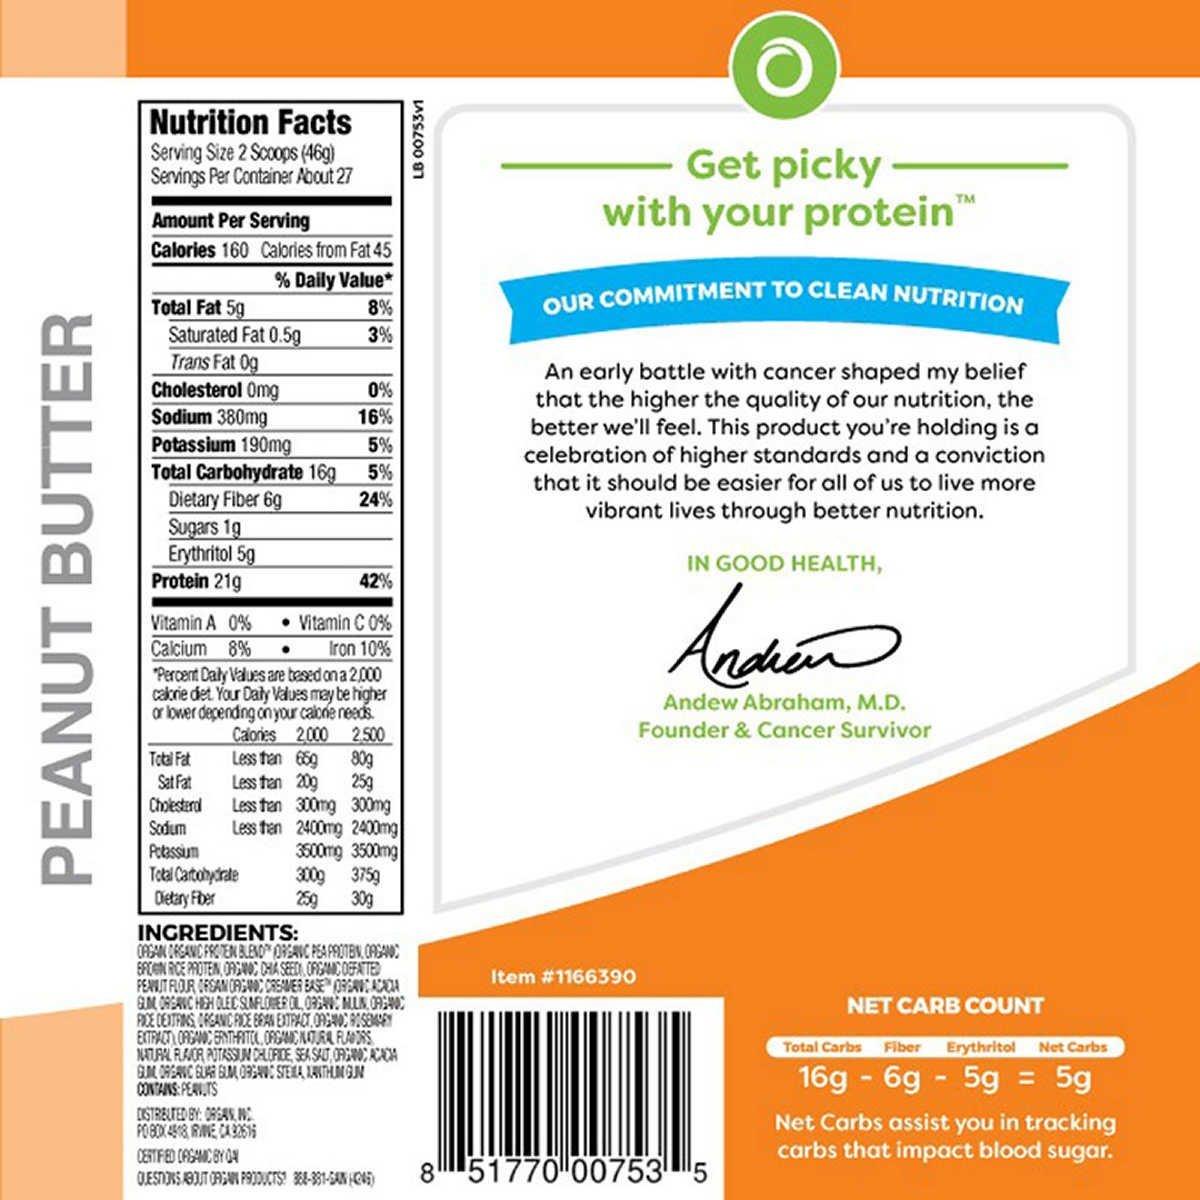 Orgain Organic Plant Based Protein Powder, Creamy Chocolate Fudge - Vegan, Low Net Carbs, Non Dairy, Gluten Free, Lactose Free, No Sugar Added, Soy Free, Kosher, Non-GMO (.2.74 Lb, PeanutButter)